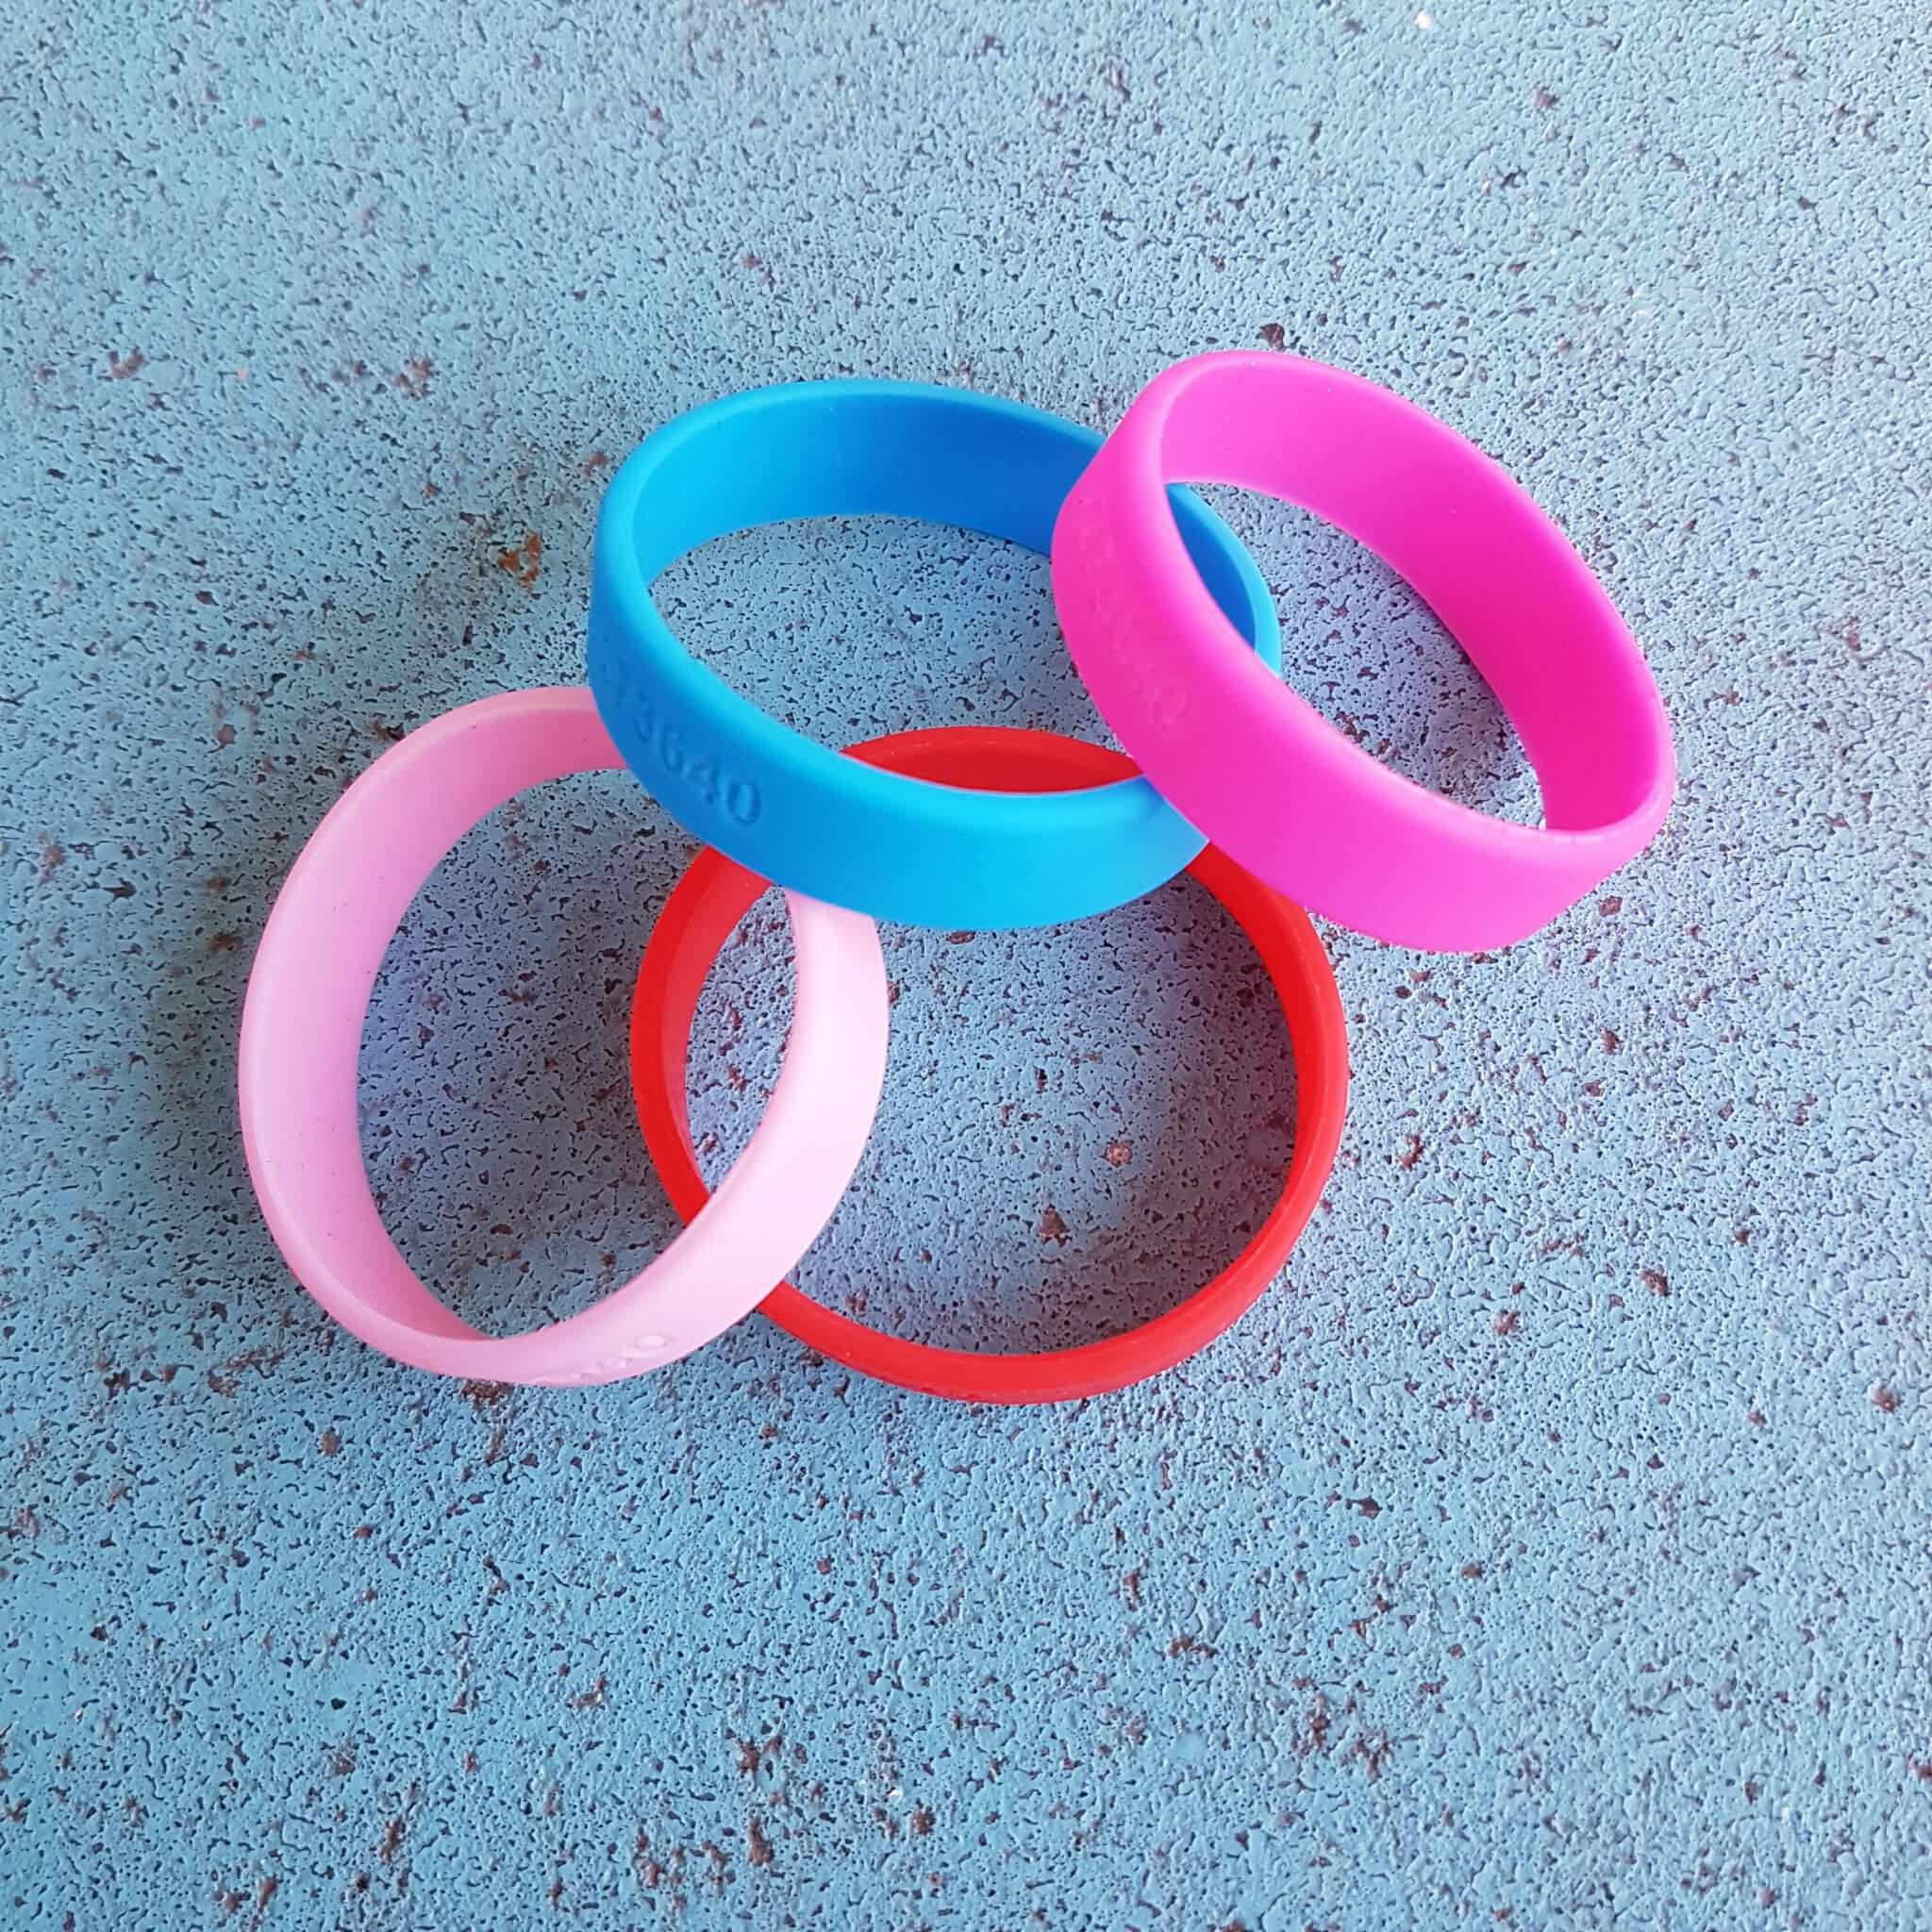 Zeer Hippe SOS armbandjes met telefoonnummer of naam – Leuk met kids &NY45